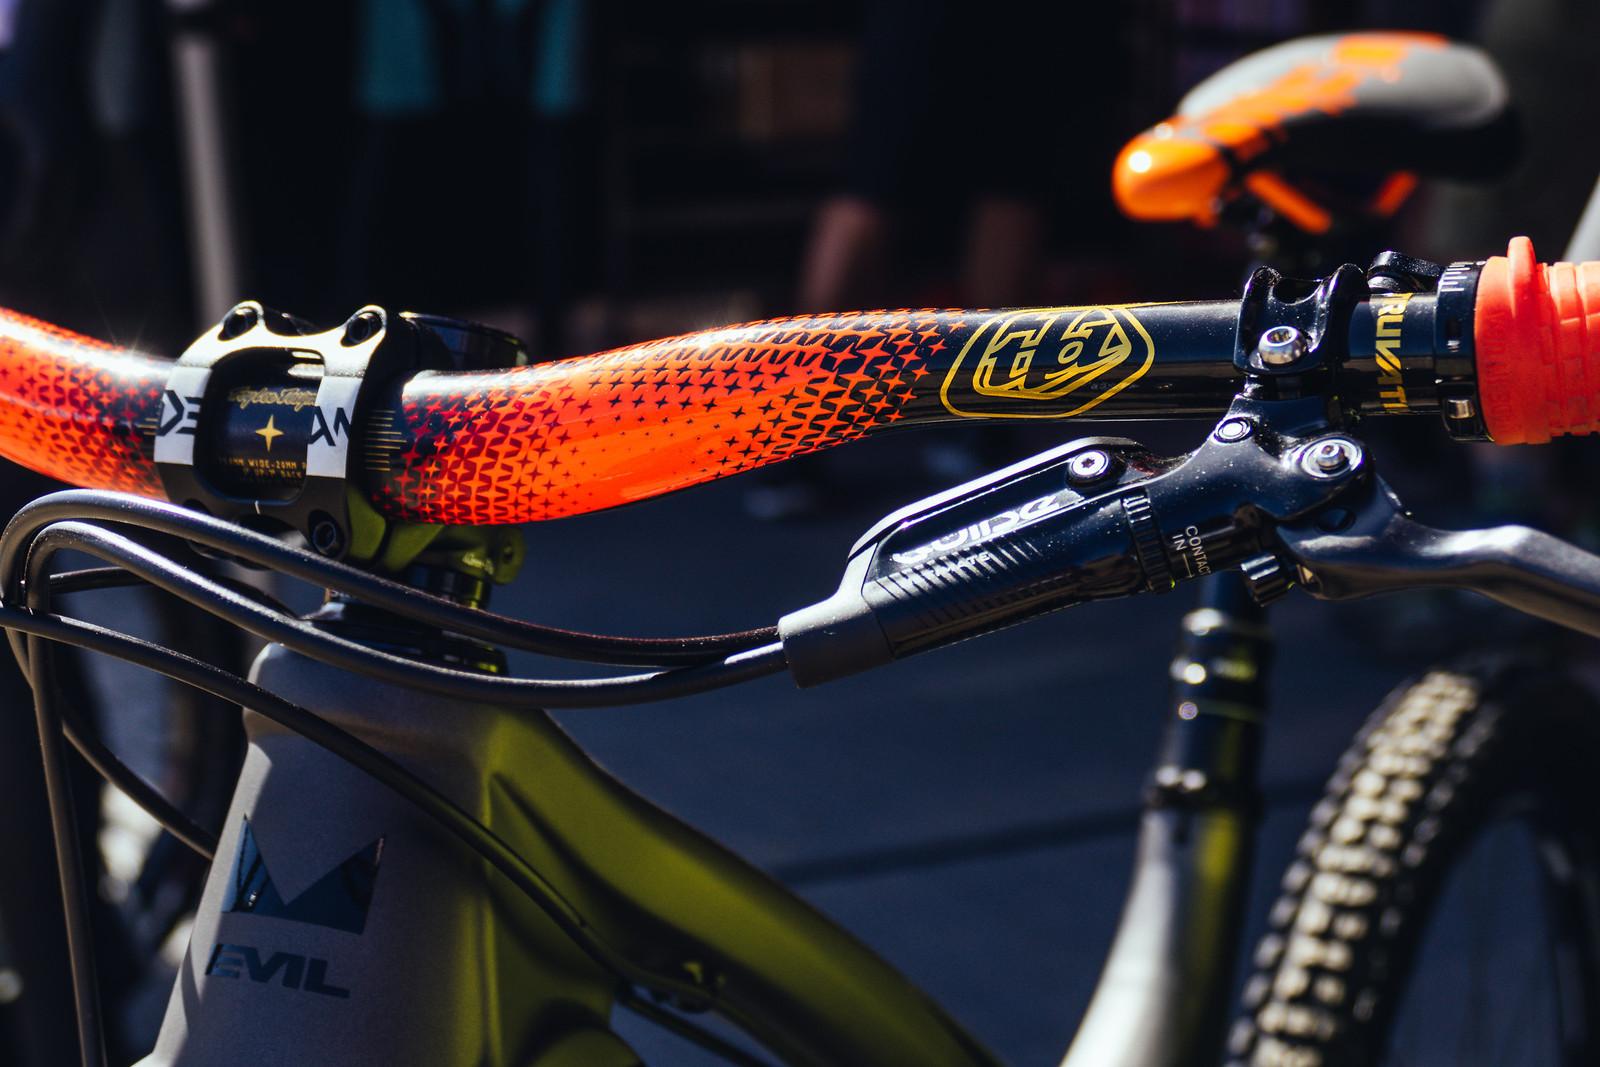 Truvativ Descendant CoLab TLD Bars and RockShox Stickers - FredLikesTrikes - Mountain Biking Pictures - Vital MTB